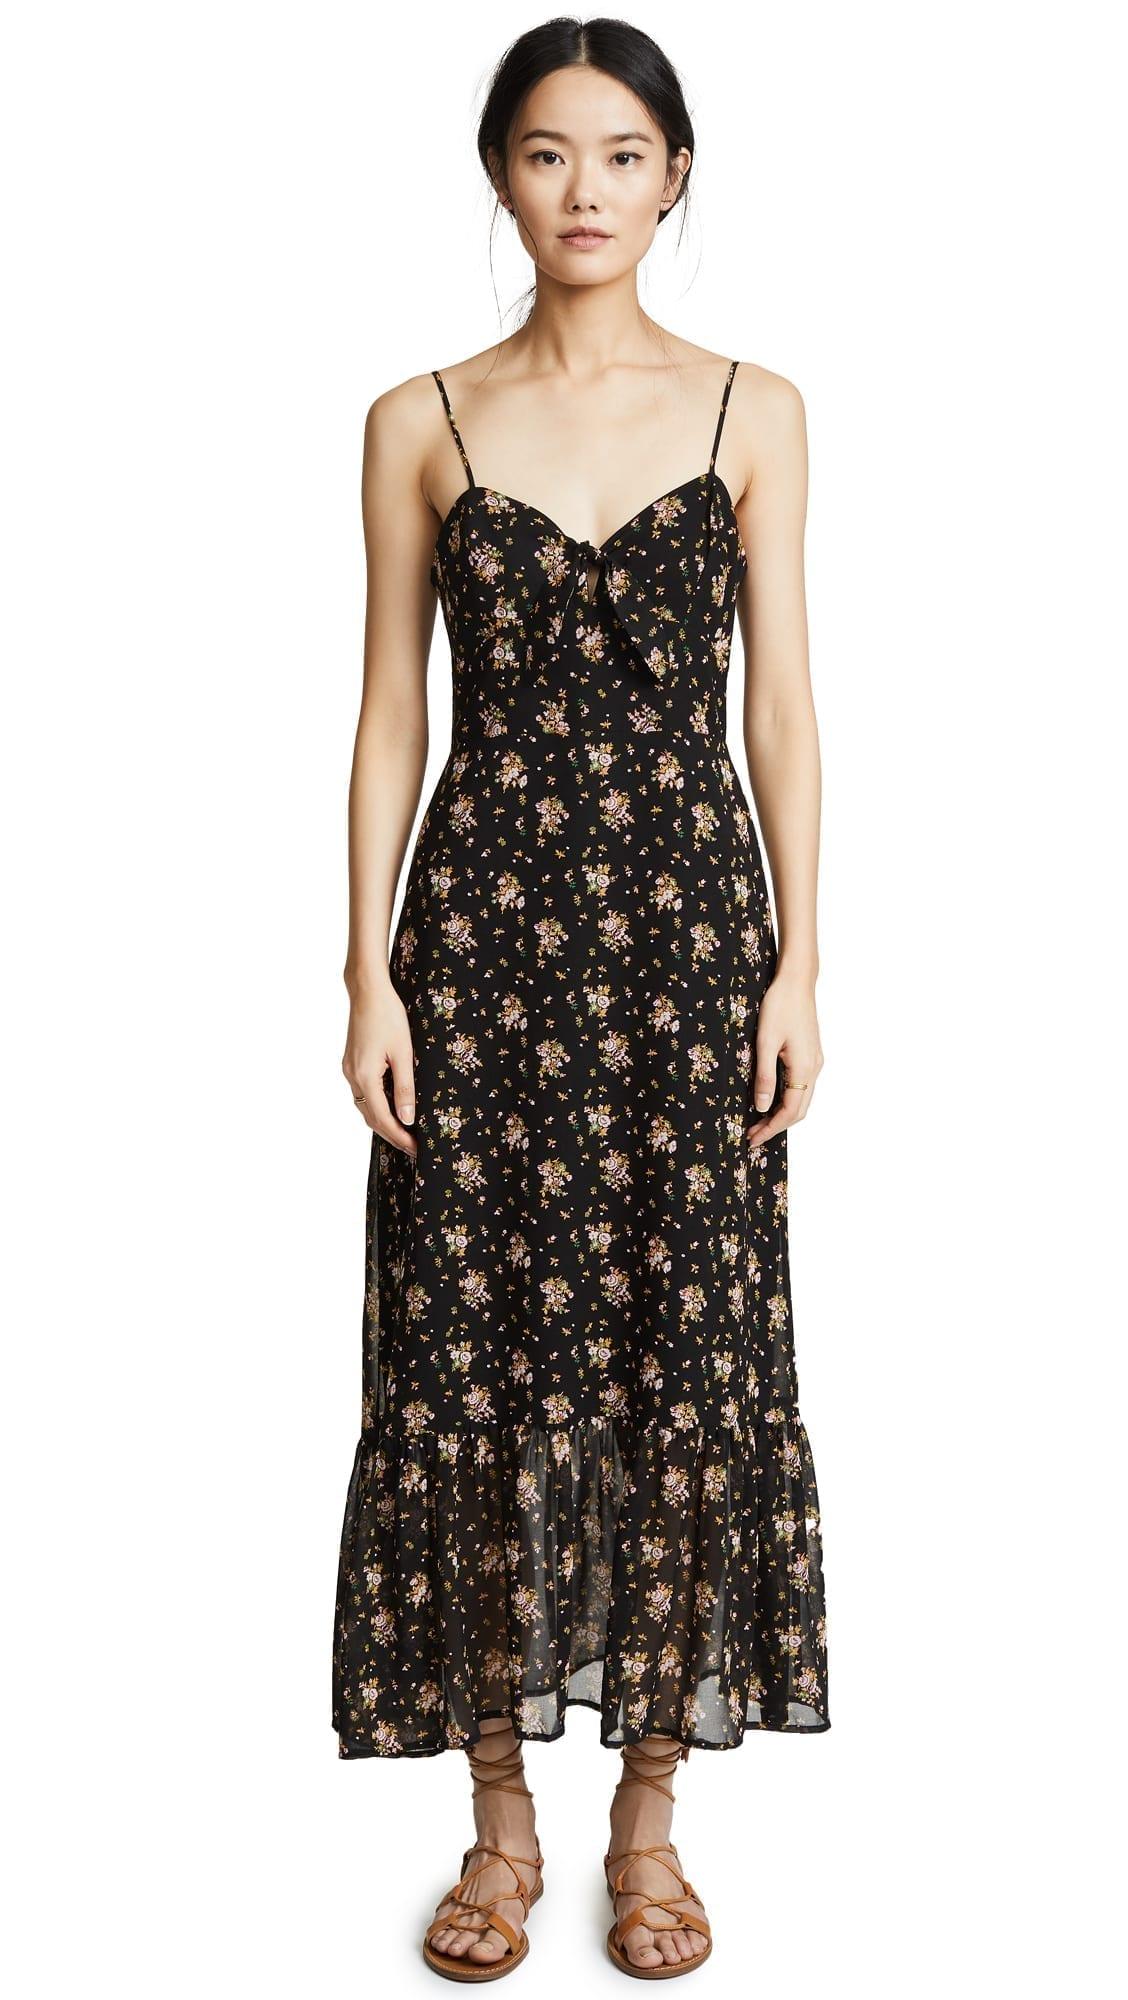 WAYF Massa Tie Knot Midi Black / Floral Printed Dress